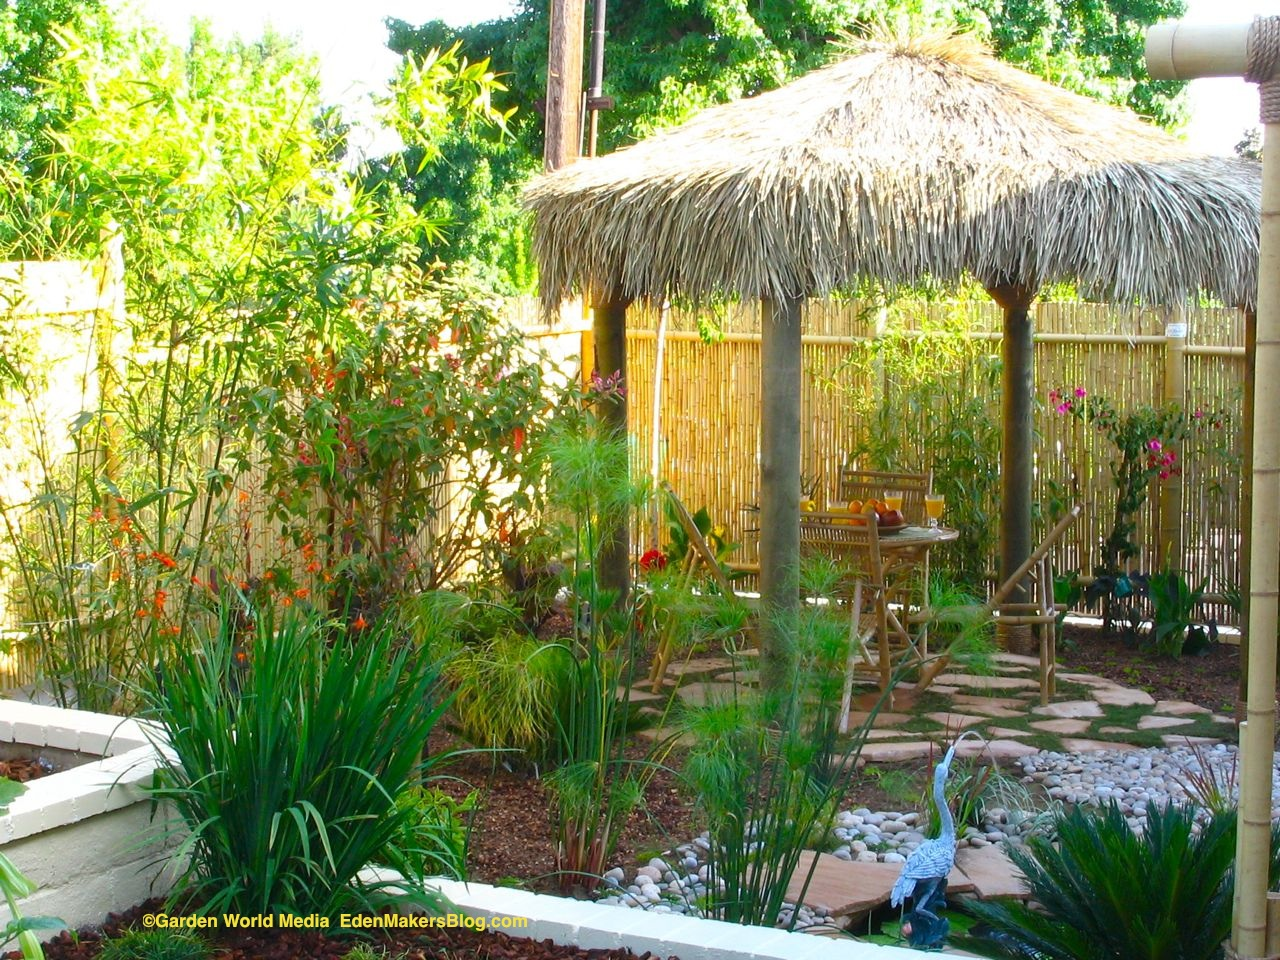 Tropical Backyard Landscaping Ideas  Home Design Elements